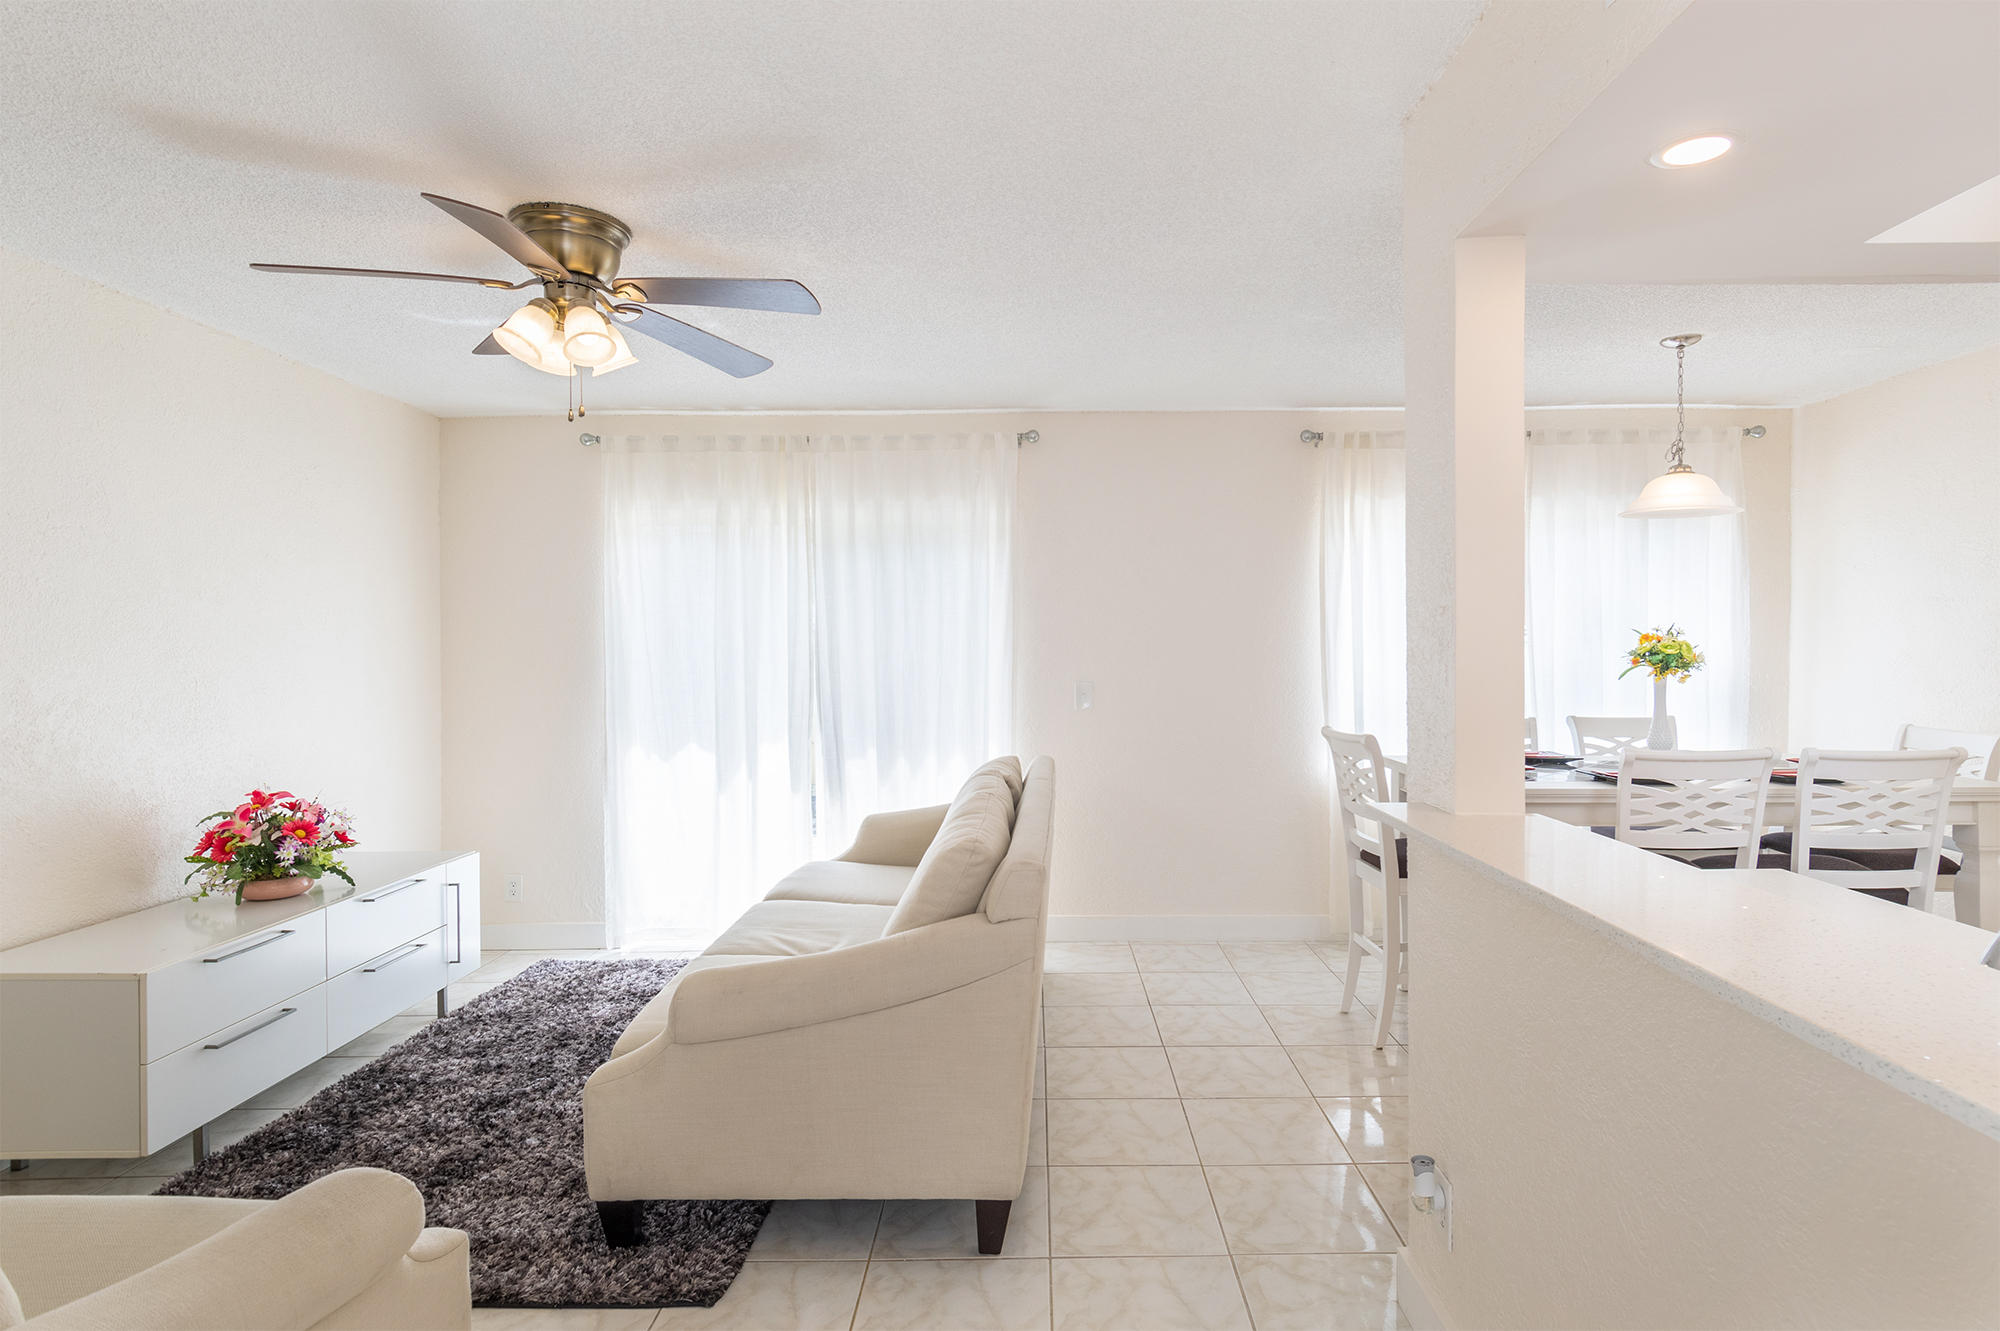 Home for sale in Habitat Ii Lauderhill Florida